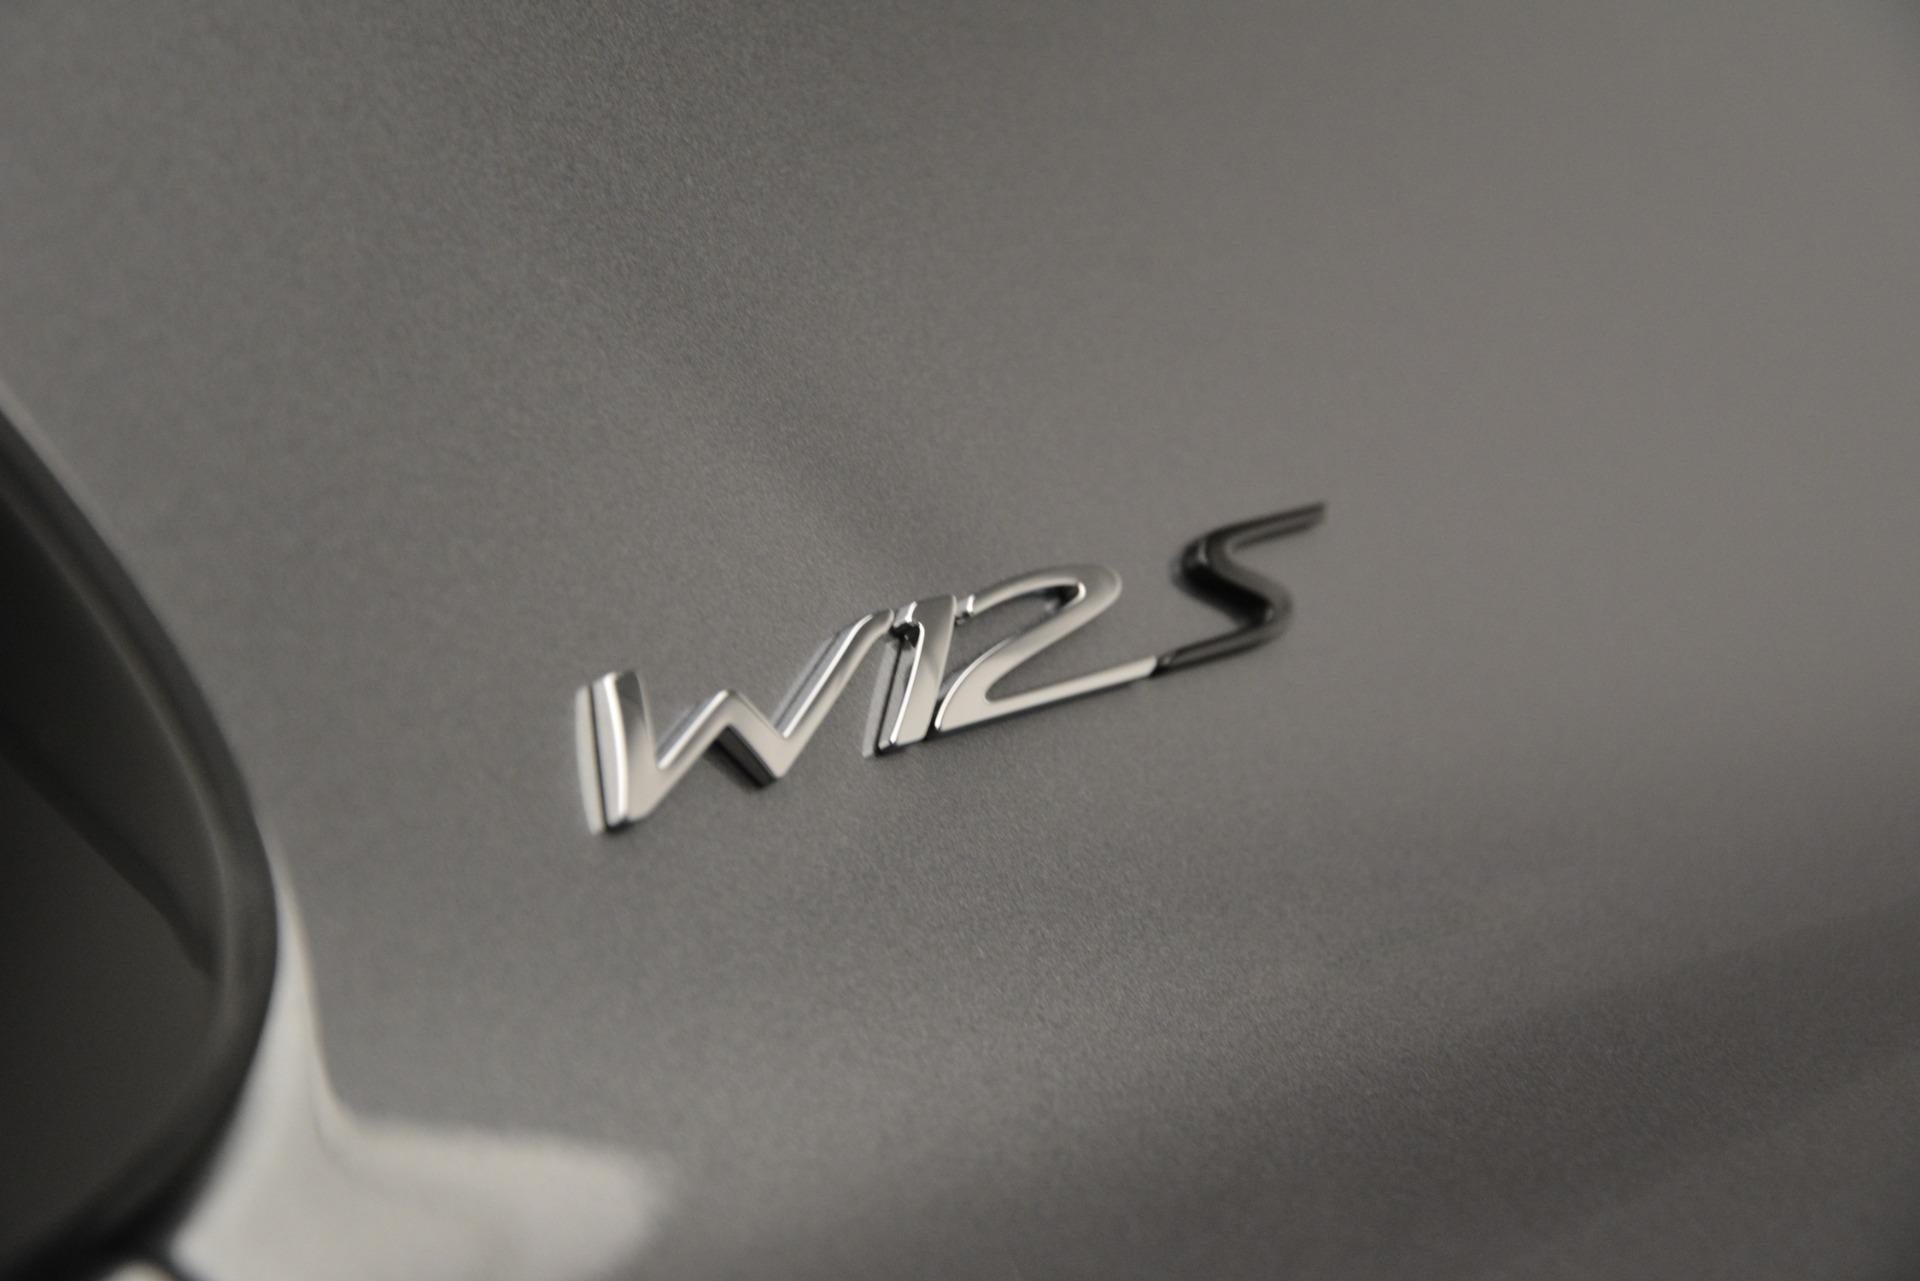 Used 2018 Bentley Flying Spur W12 S For Sale In Westport, CT 2973_p15